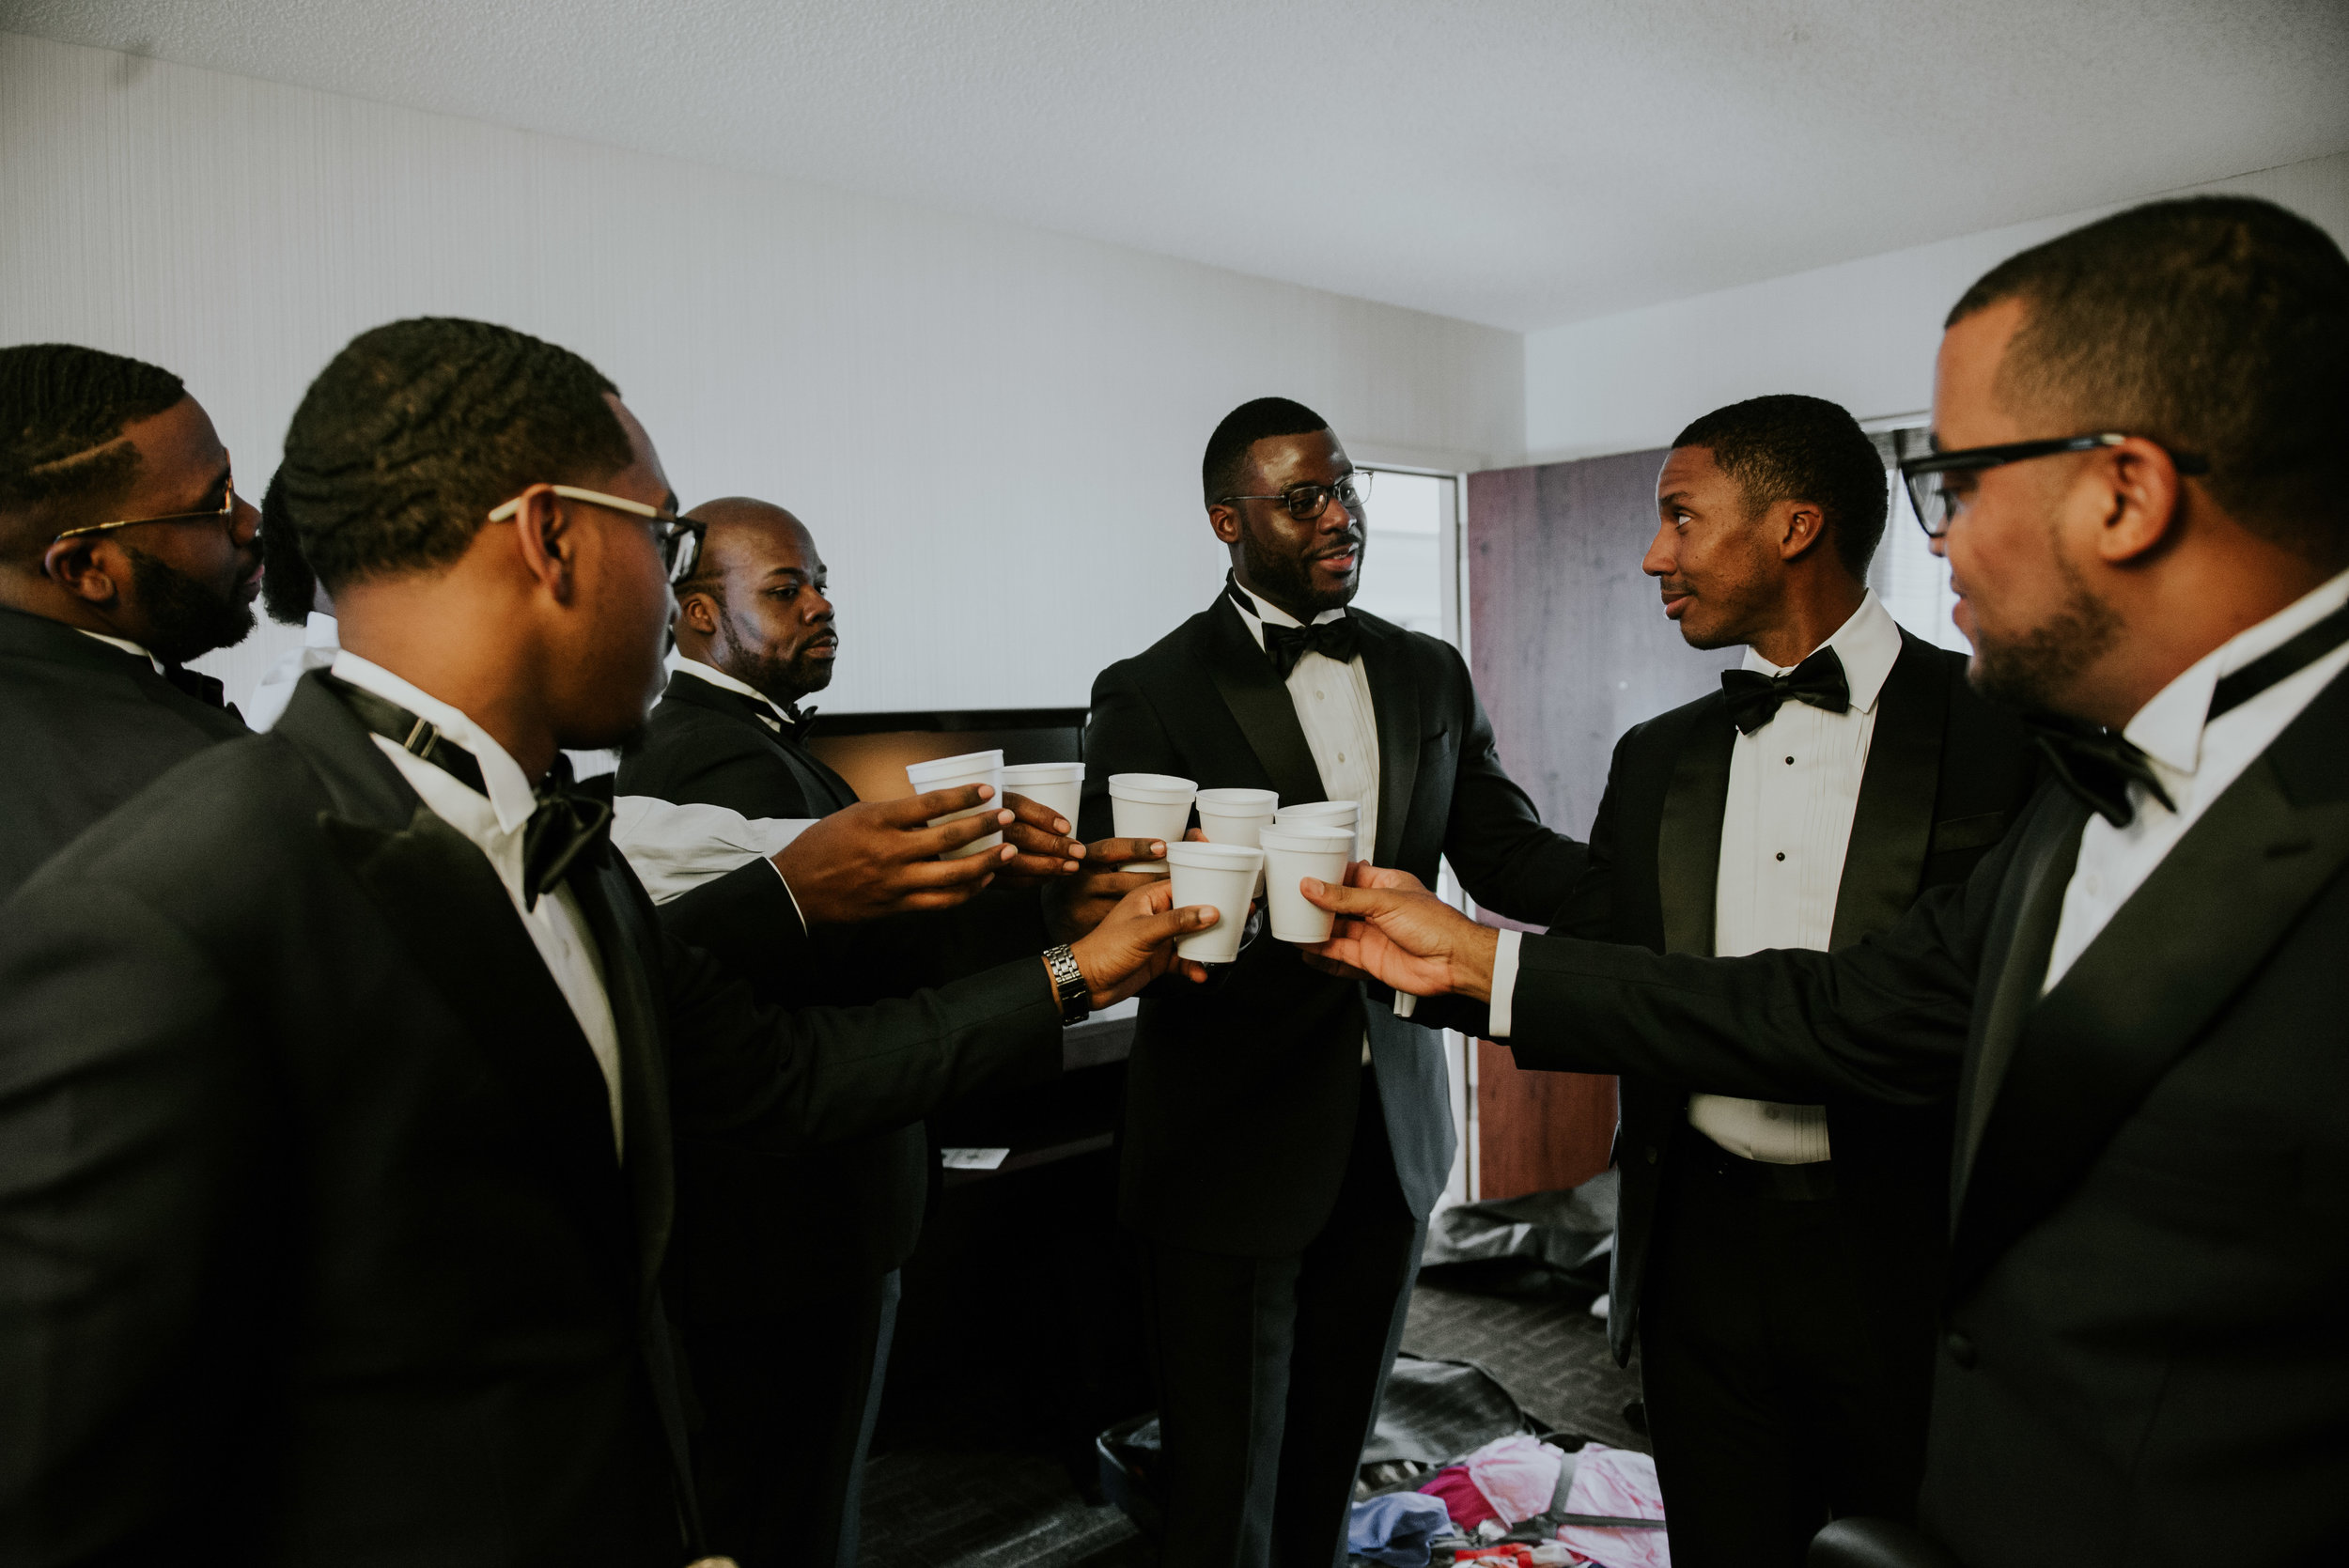 Groomsmen toasting to groom before wedding ceremony